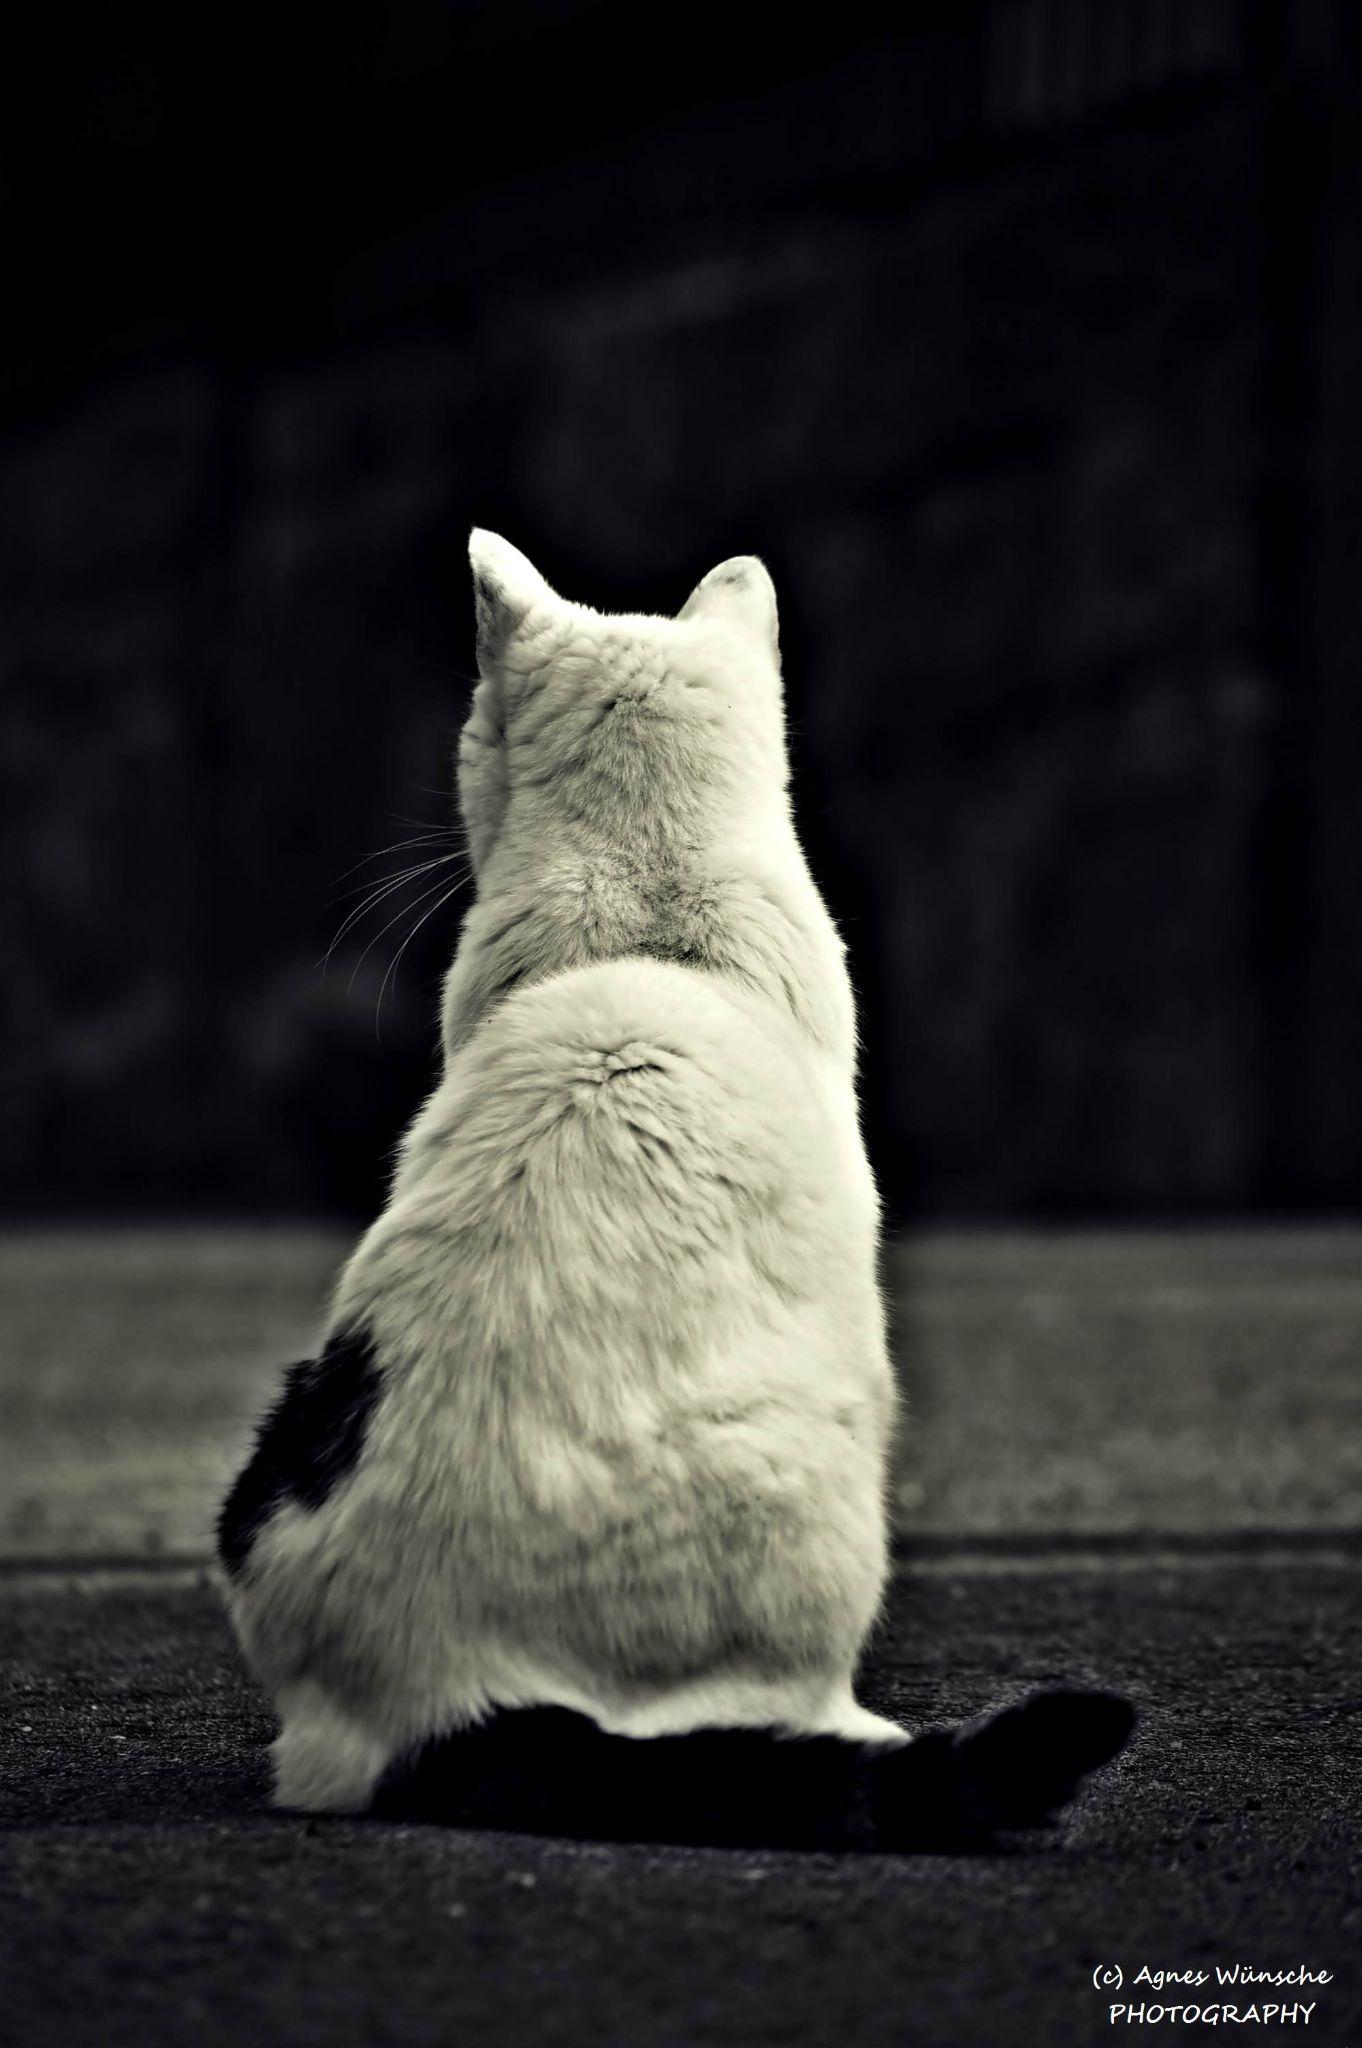 Cat by agneswuensche